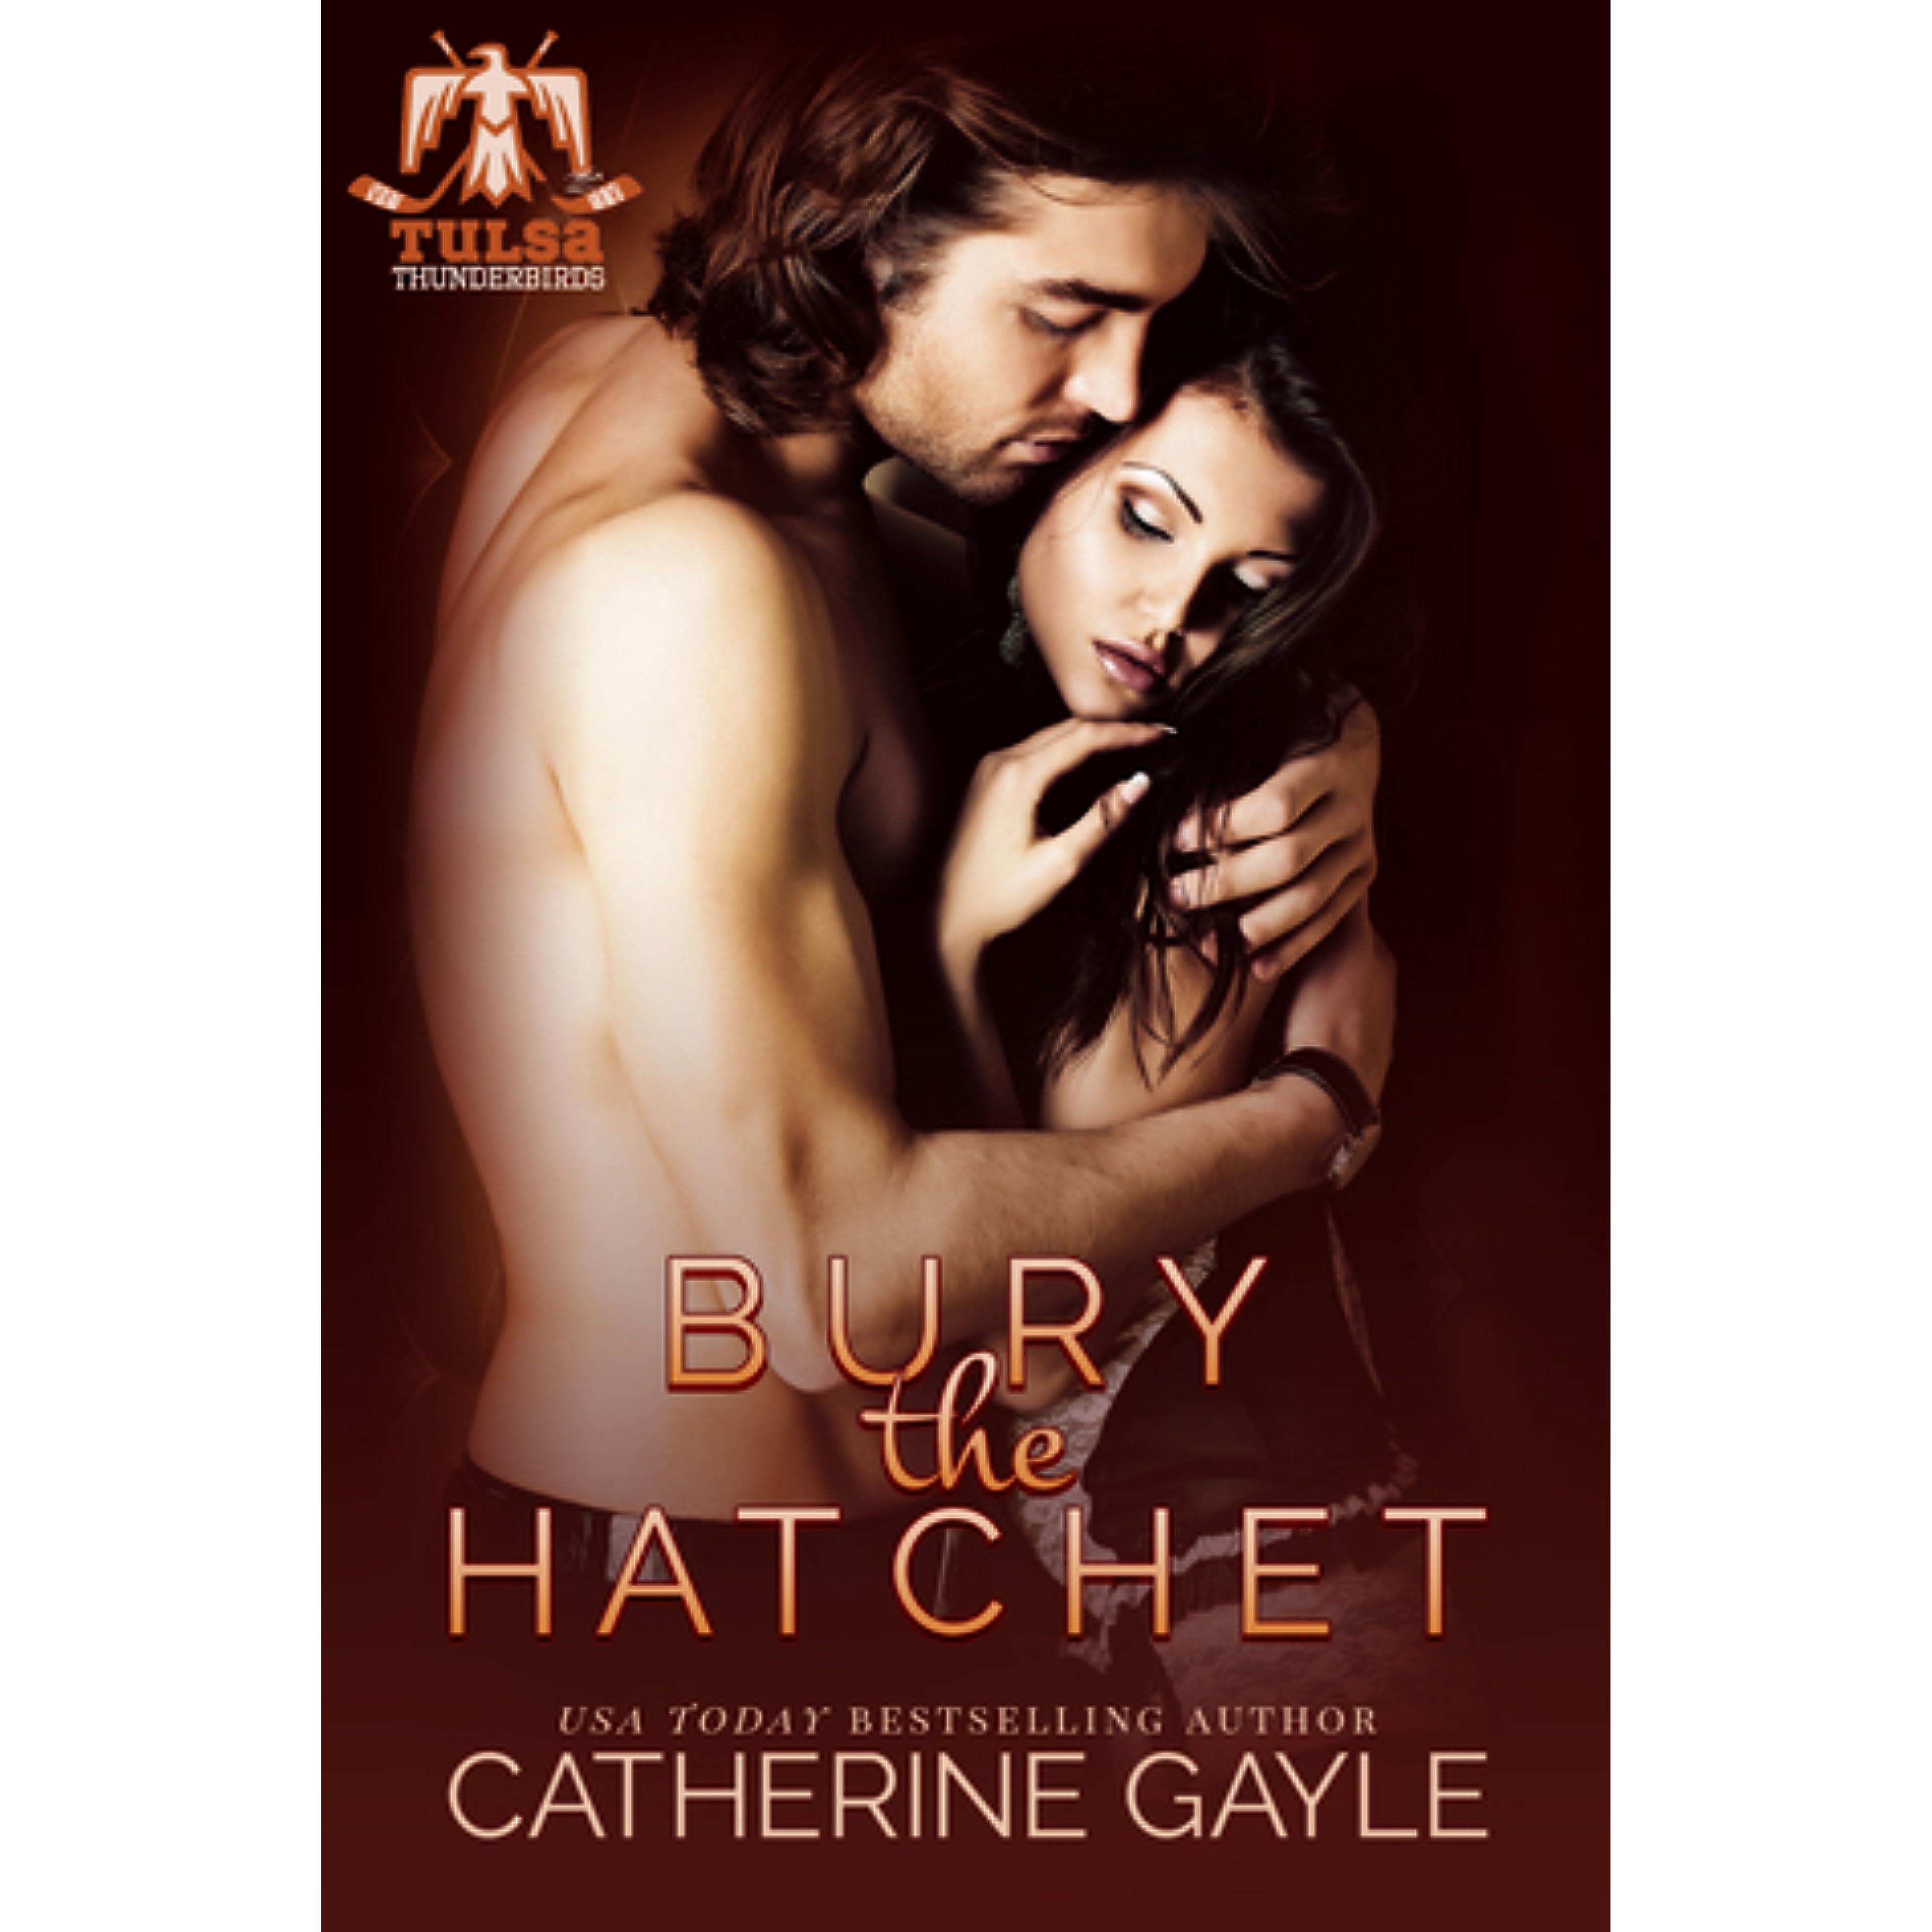 Bury the Hatchet (Tulsa Thunderbirds, #1) by Catherine Gayle